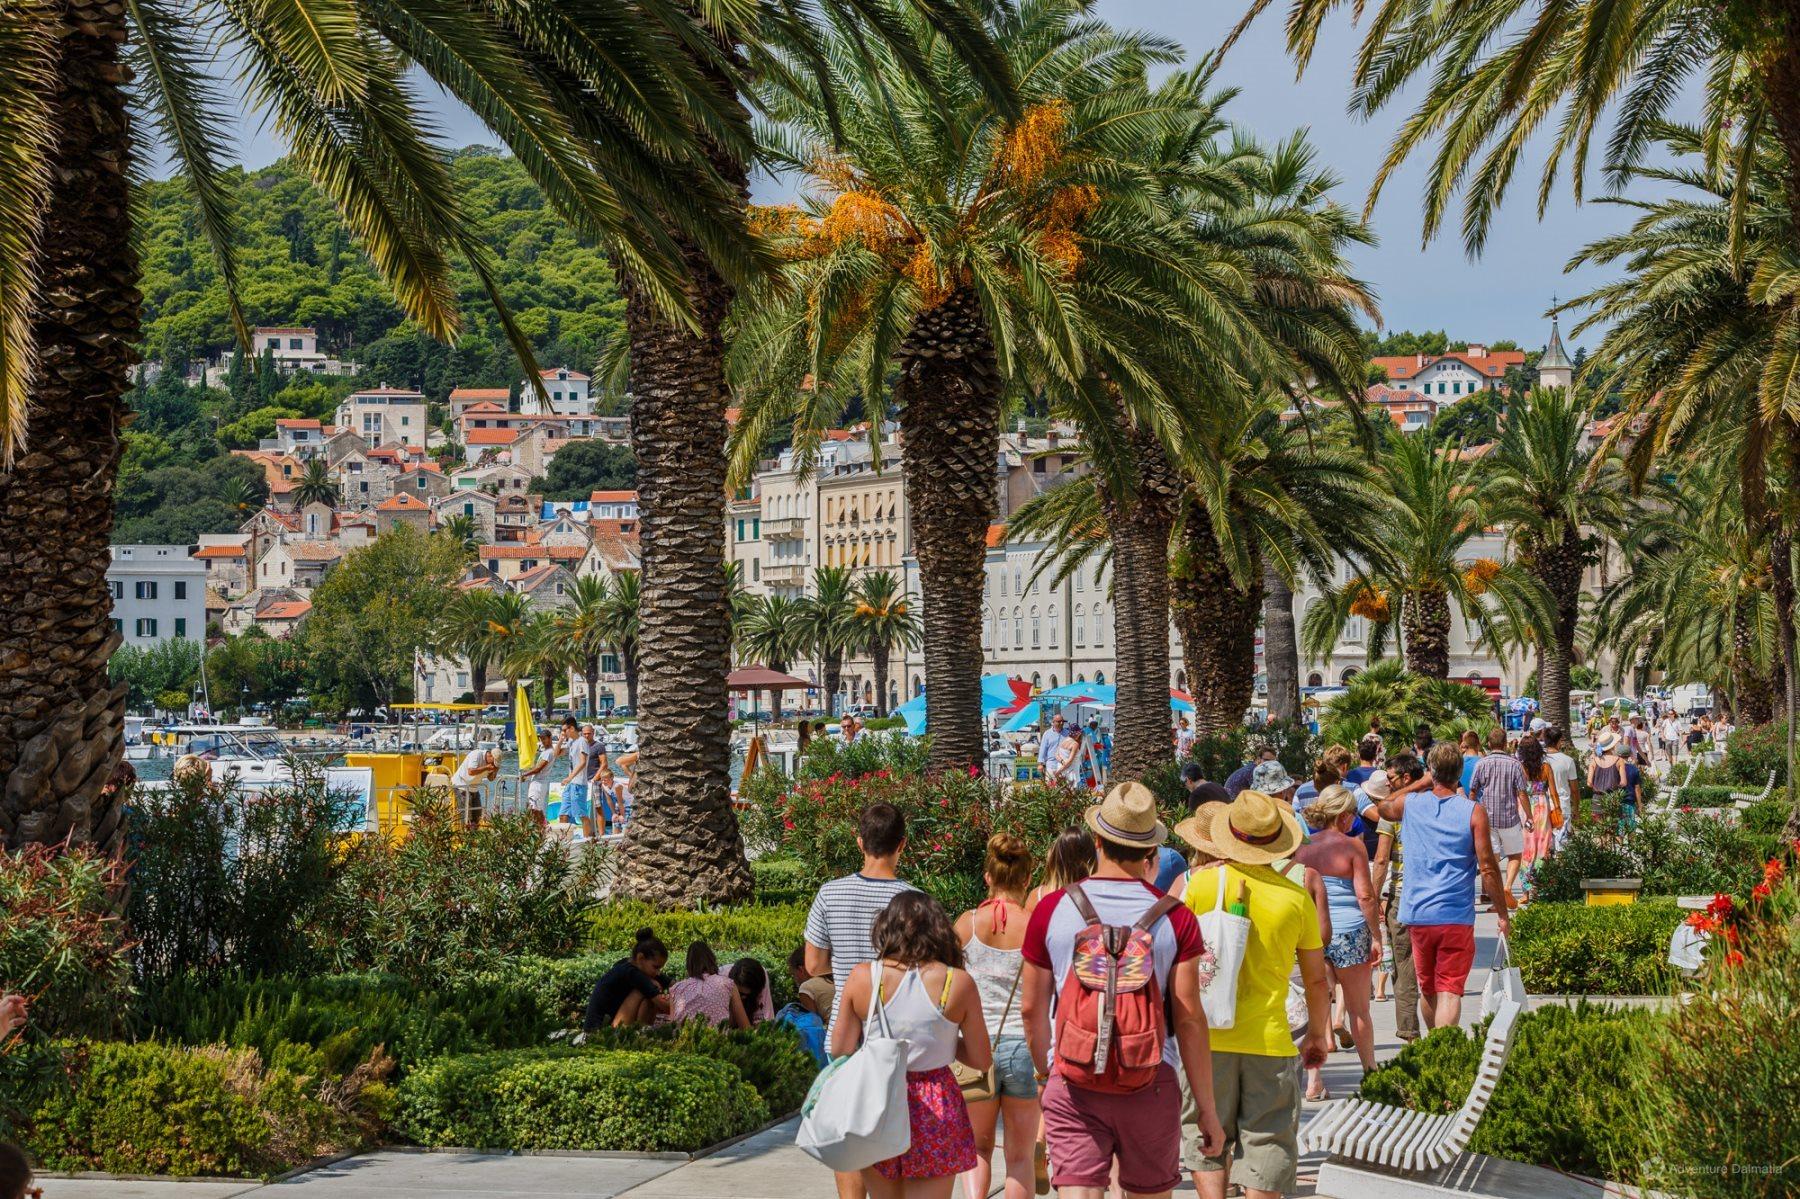 Promenade during summer